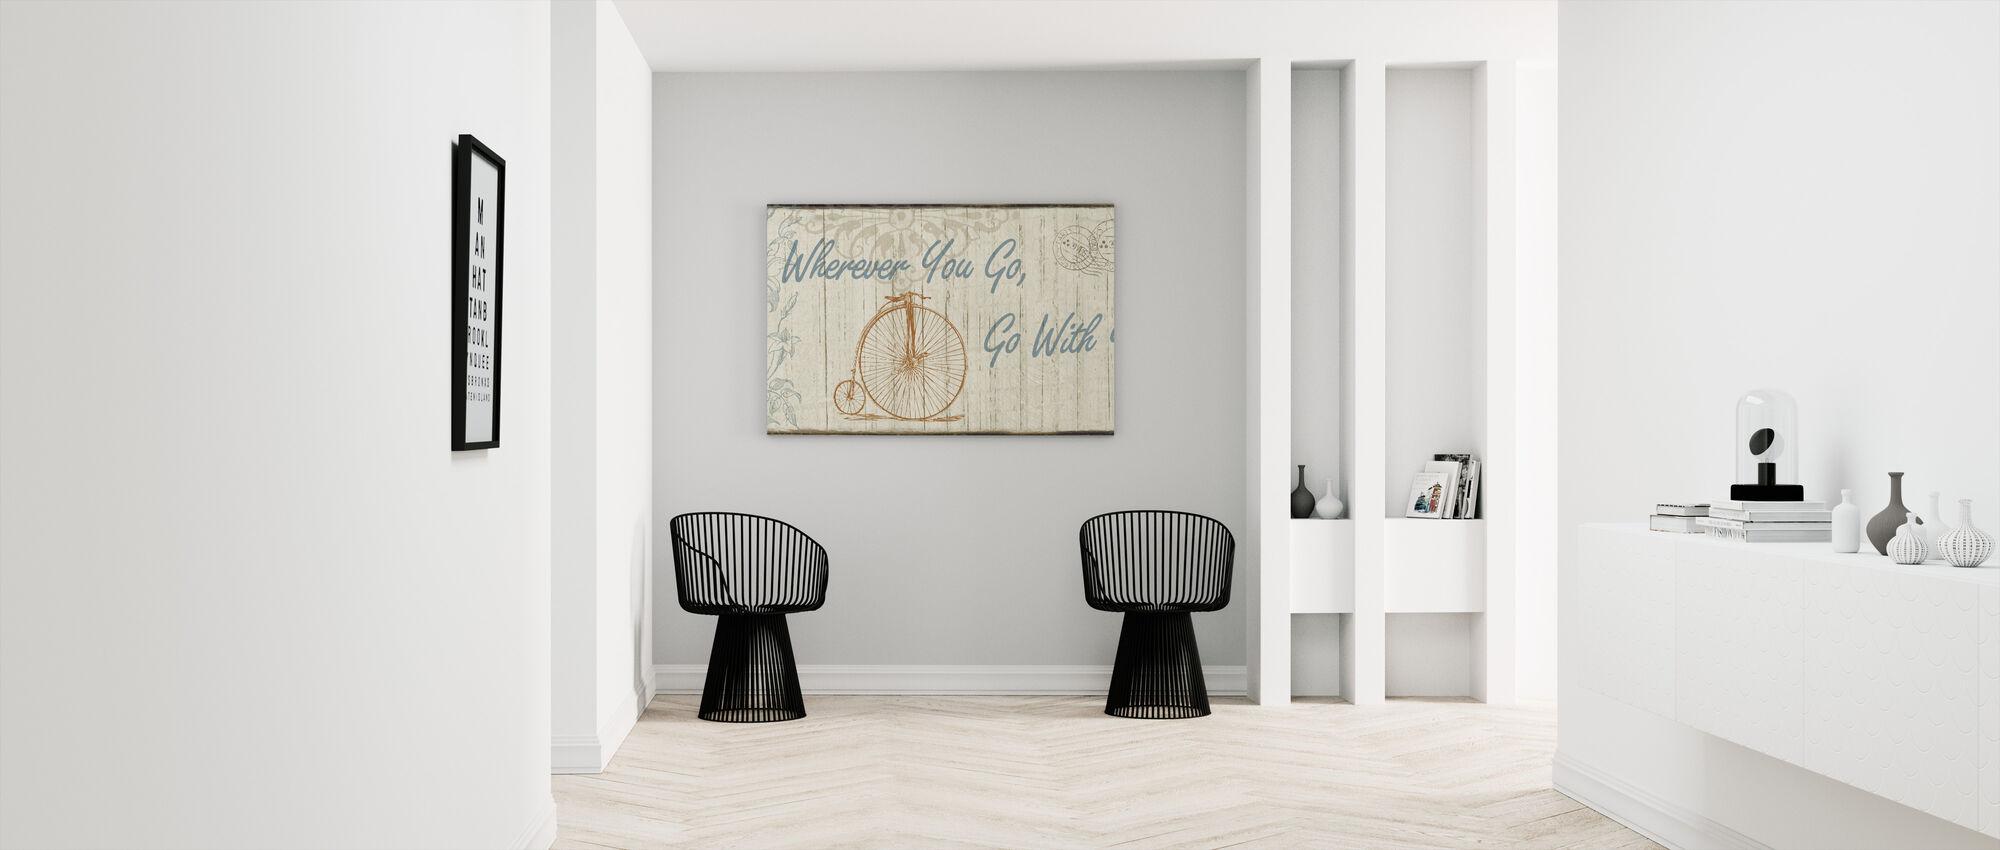 Go With Your Heart - Canvas print - Hallway